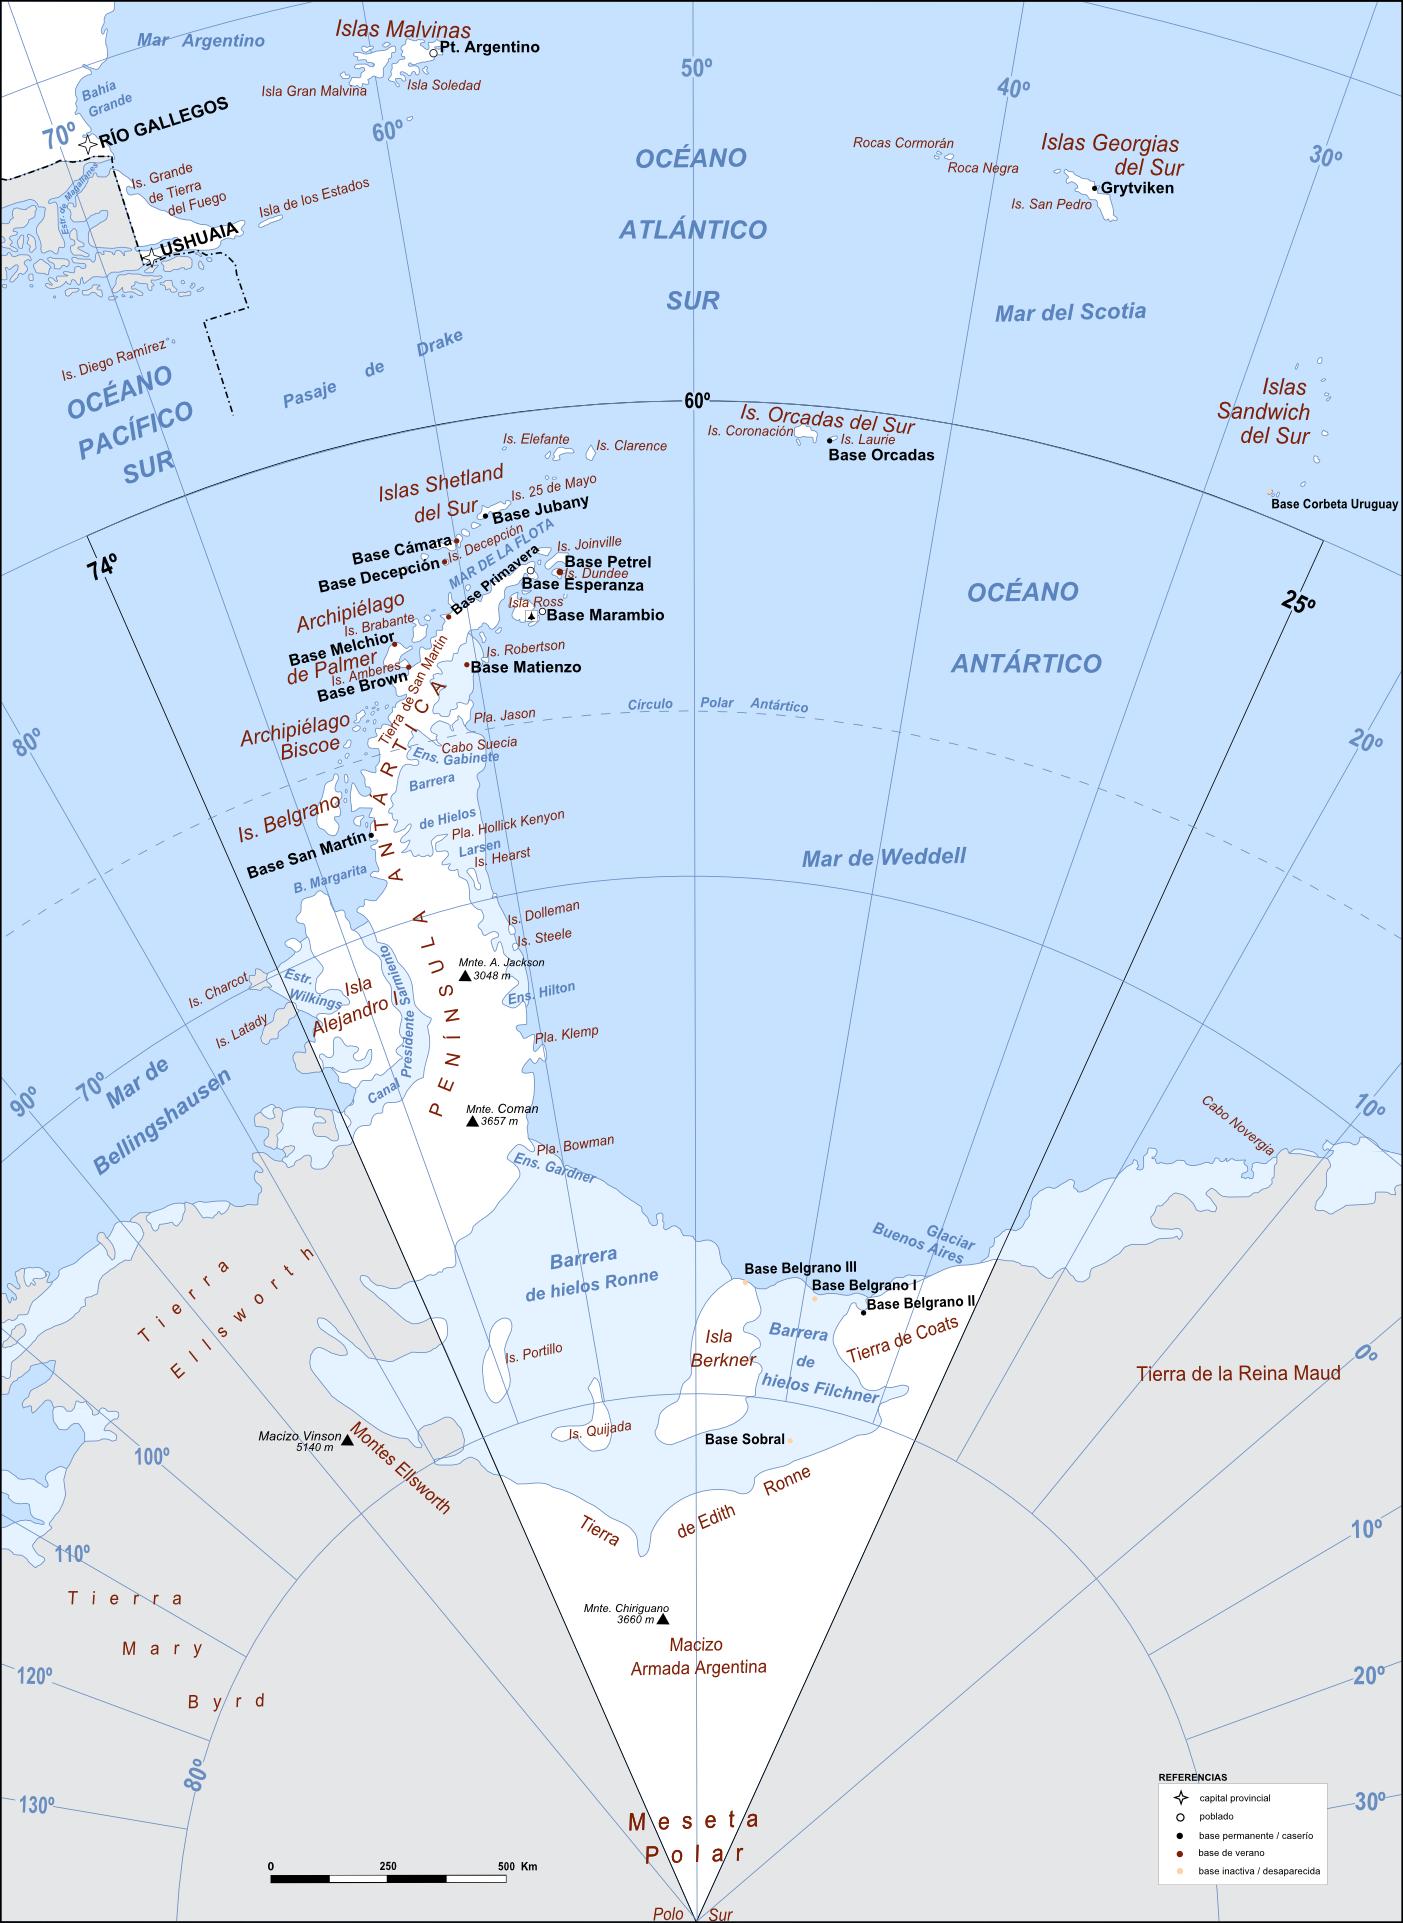 Mapa de la Antártida Argentina